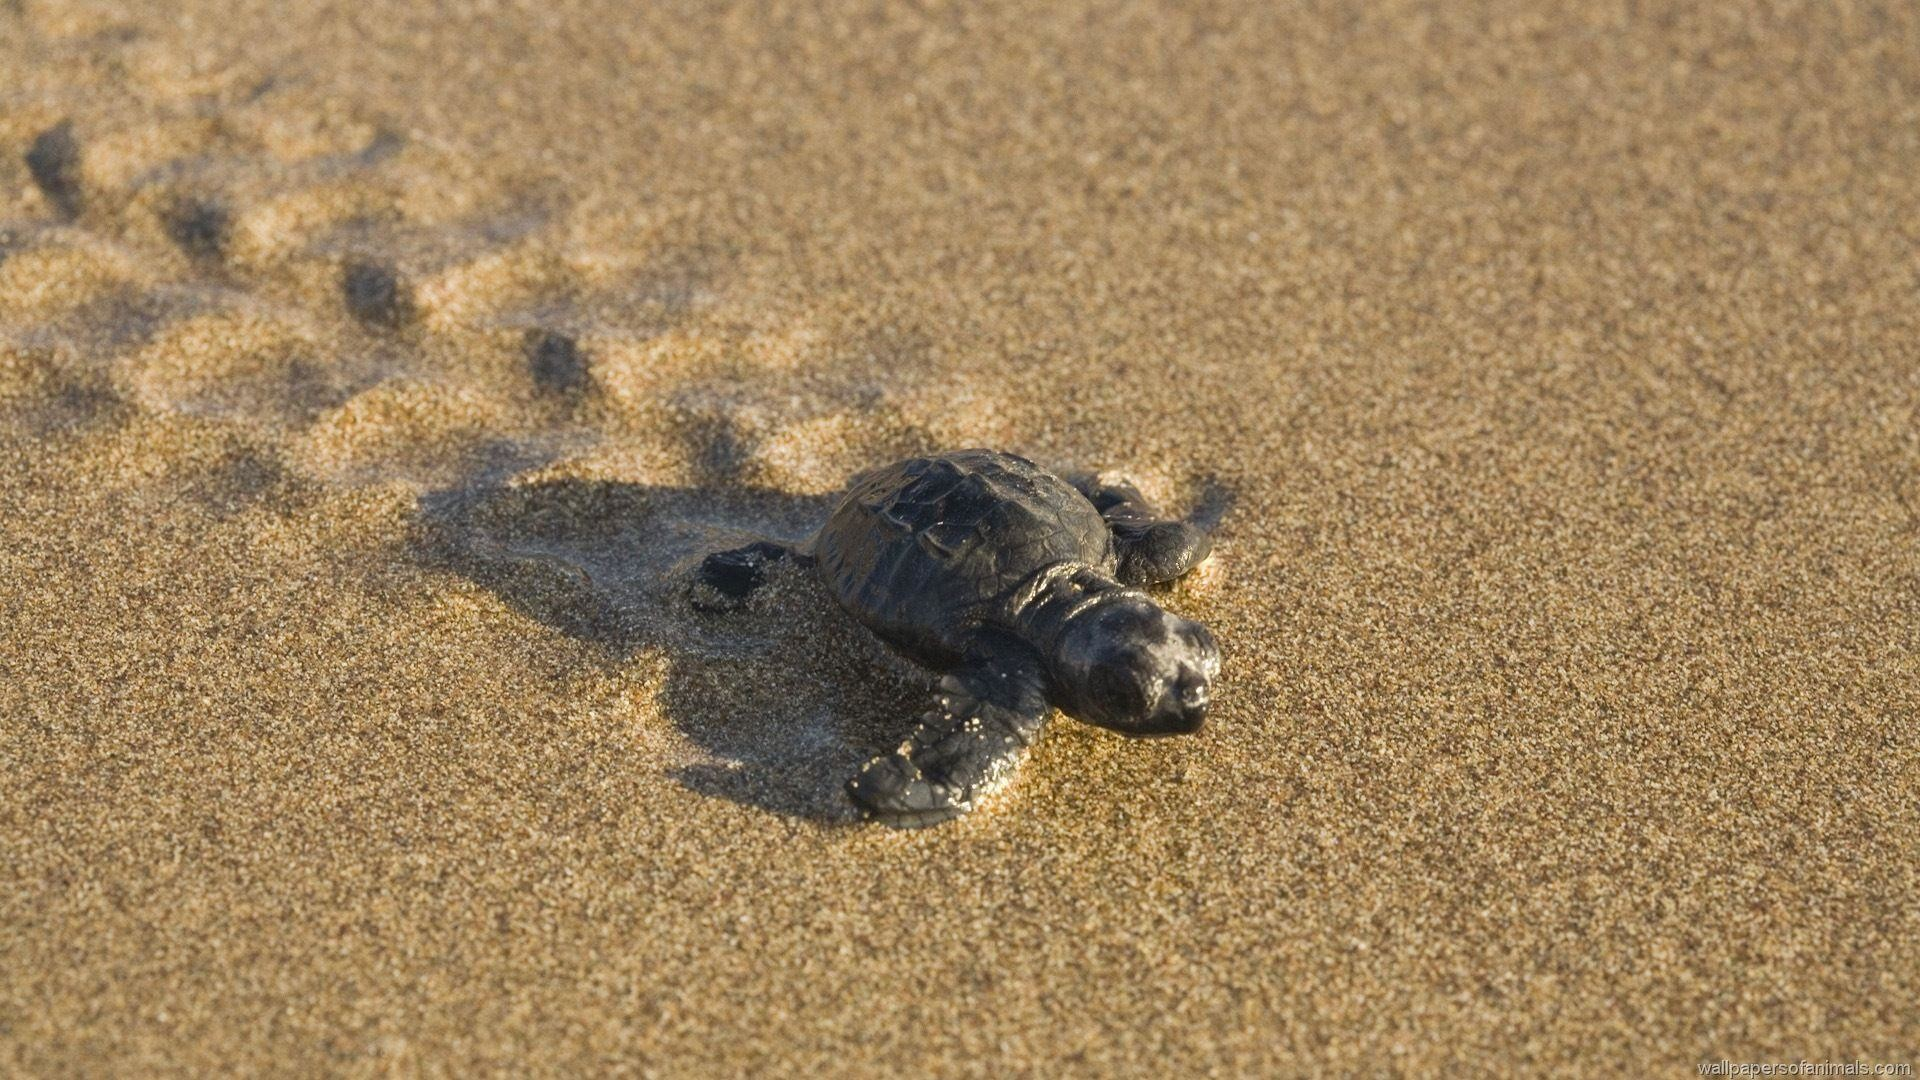 Pin Baby Turtle Wallpaper on Pinterest